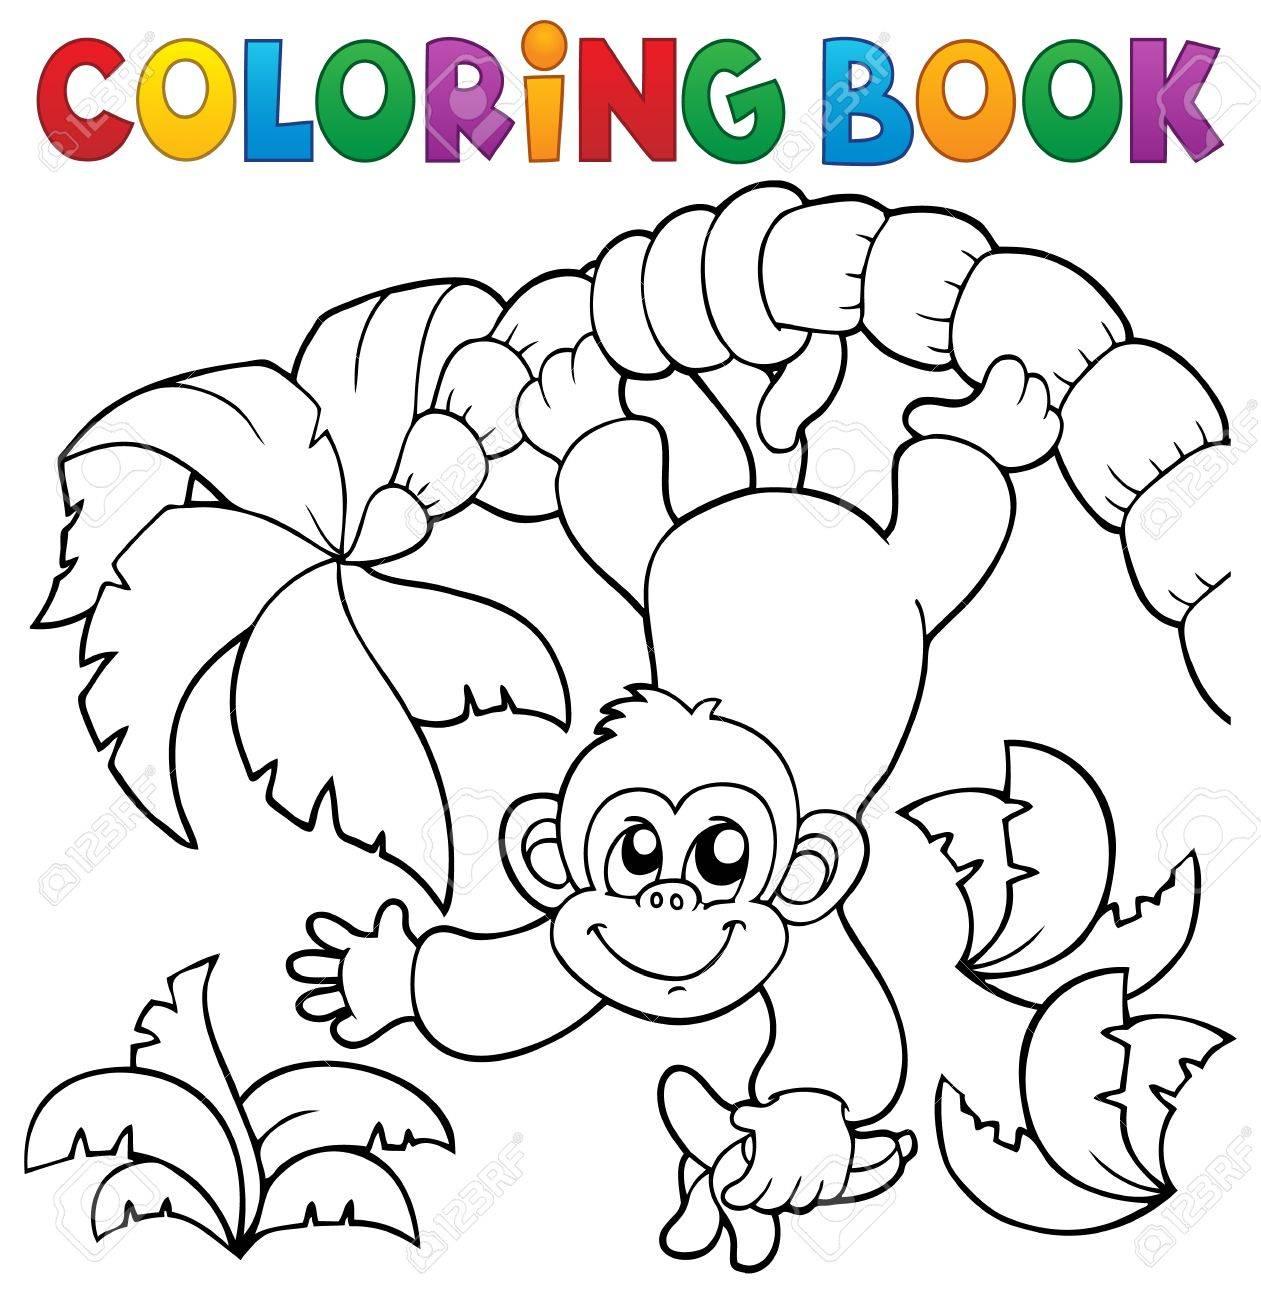 Libro Para Colorear Mono Tema 2 - Eps10 Ilustración Vectorial ...